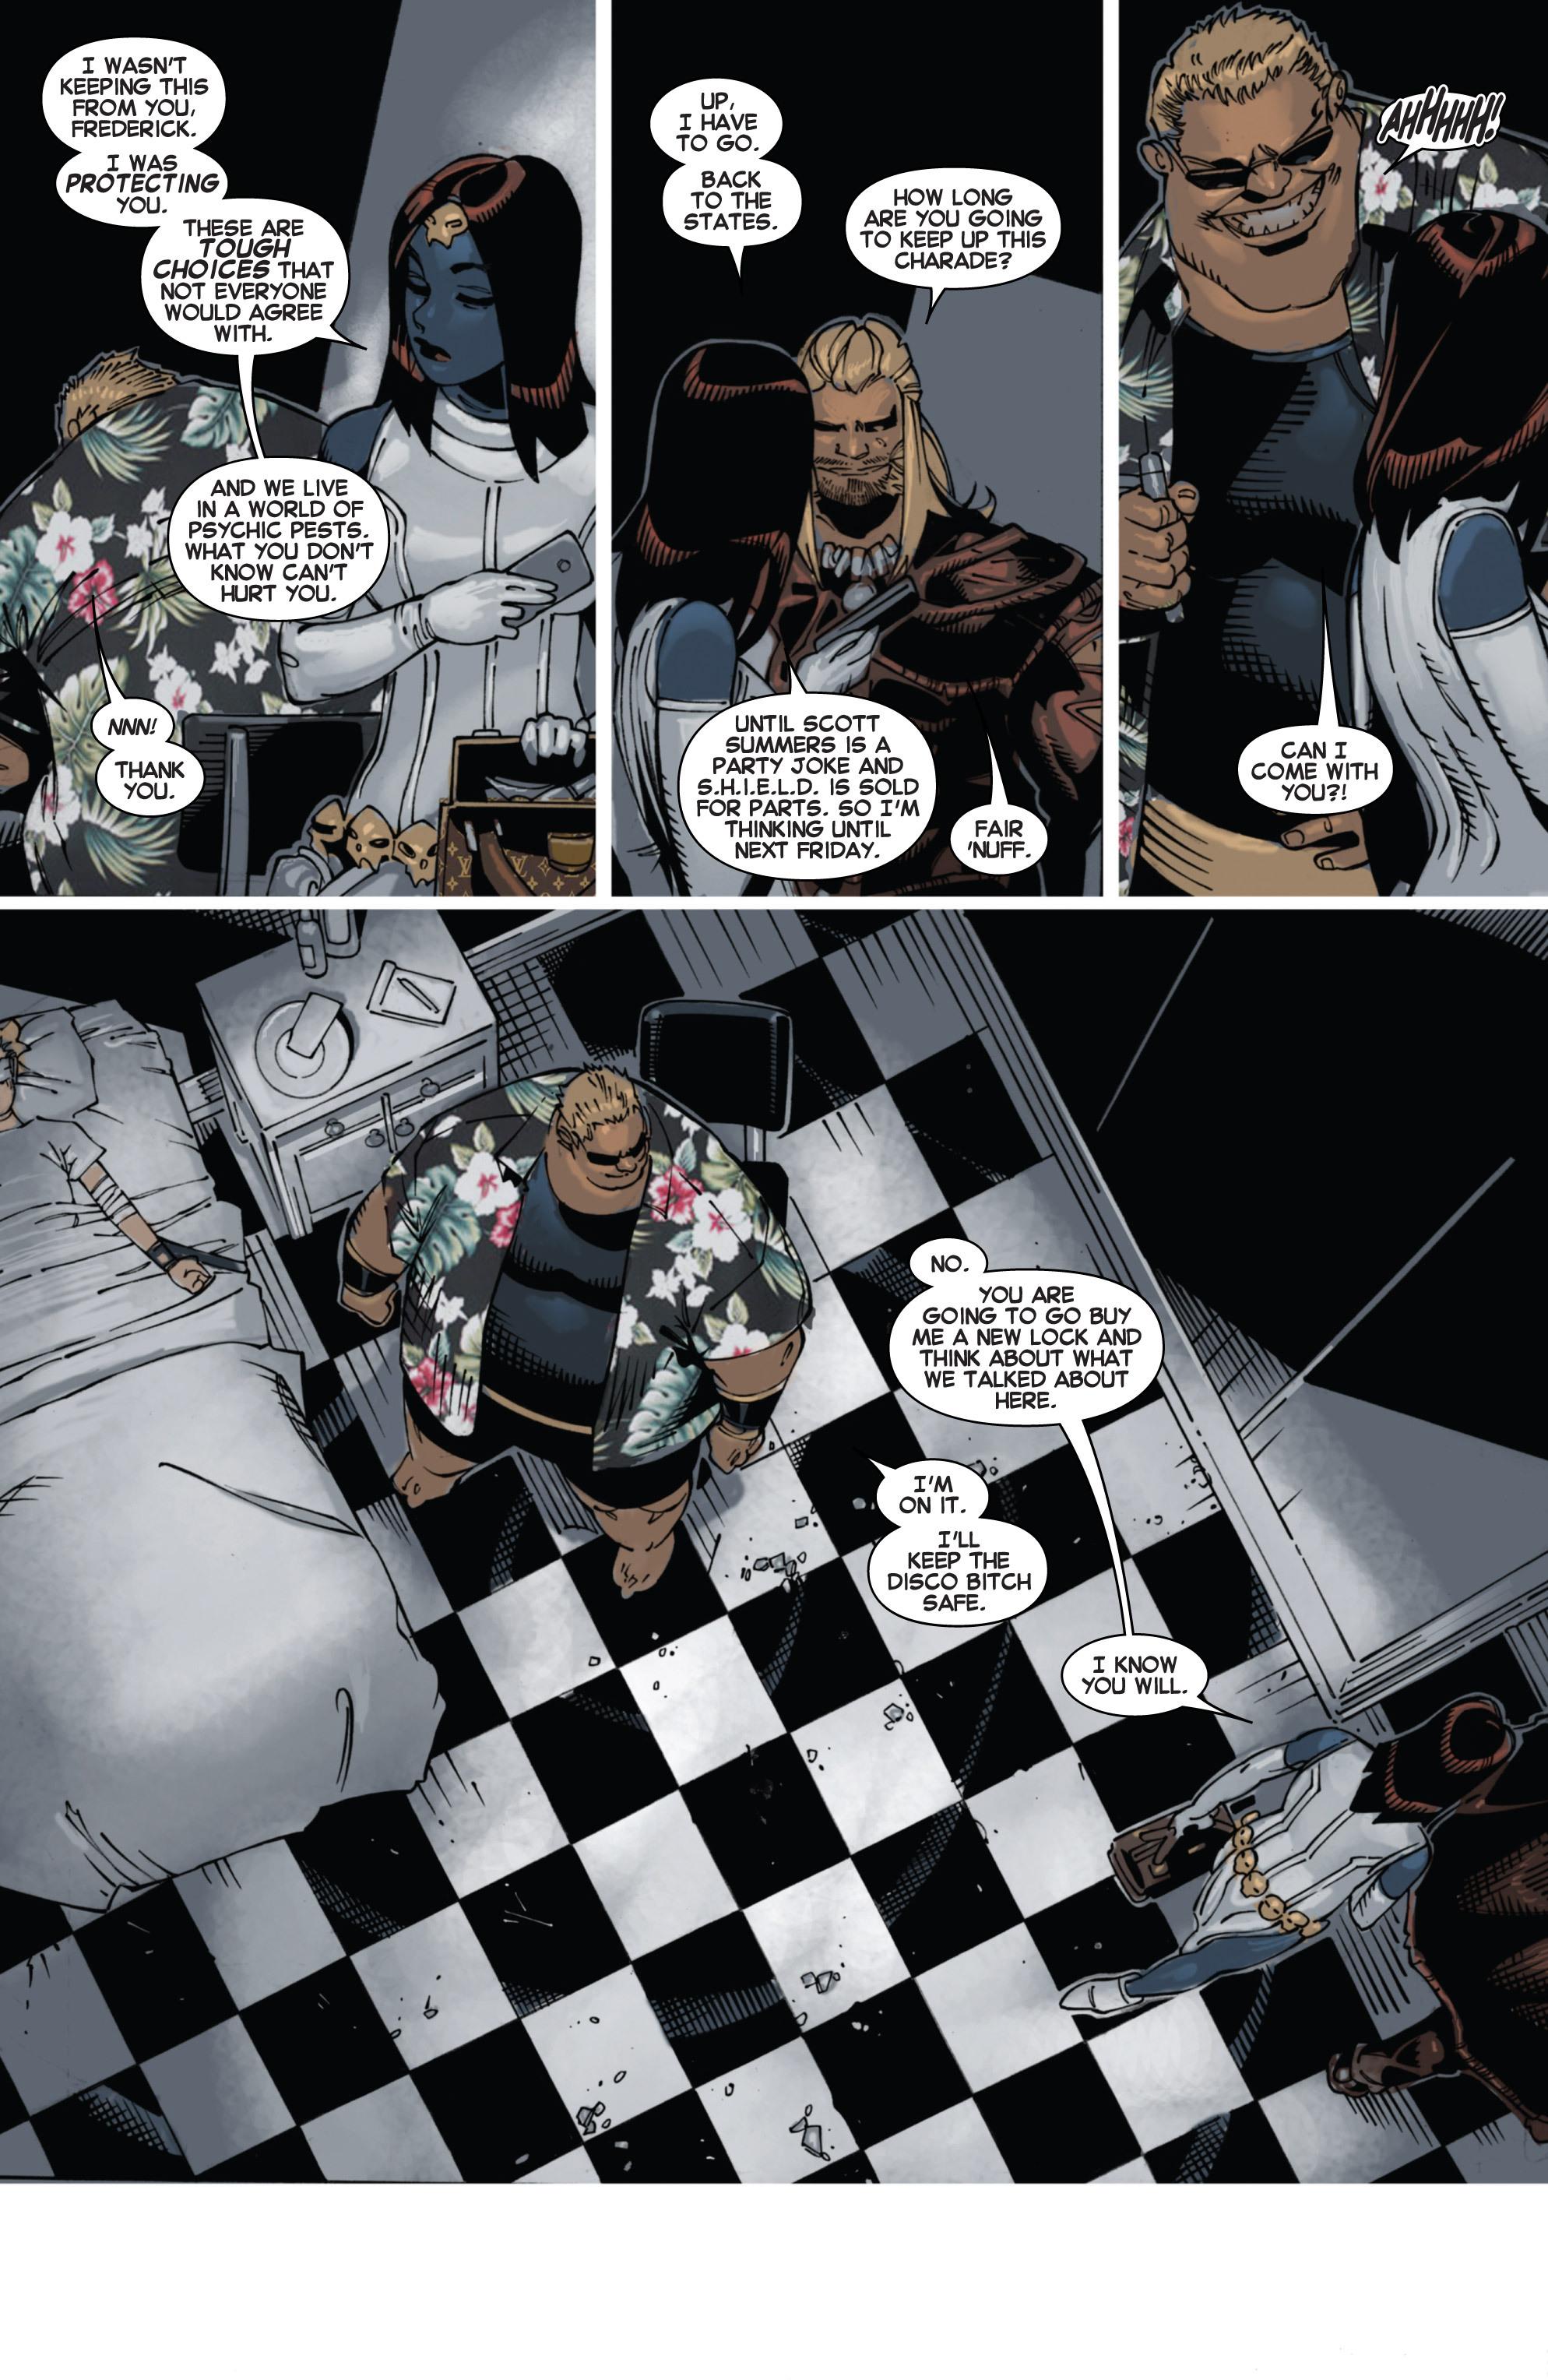 Read online Uncanny X-Men (2013) comic -  Issue # _TPB 4 - vs. S.H.I.E.L.D - 32